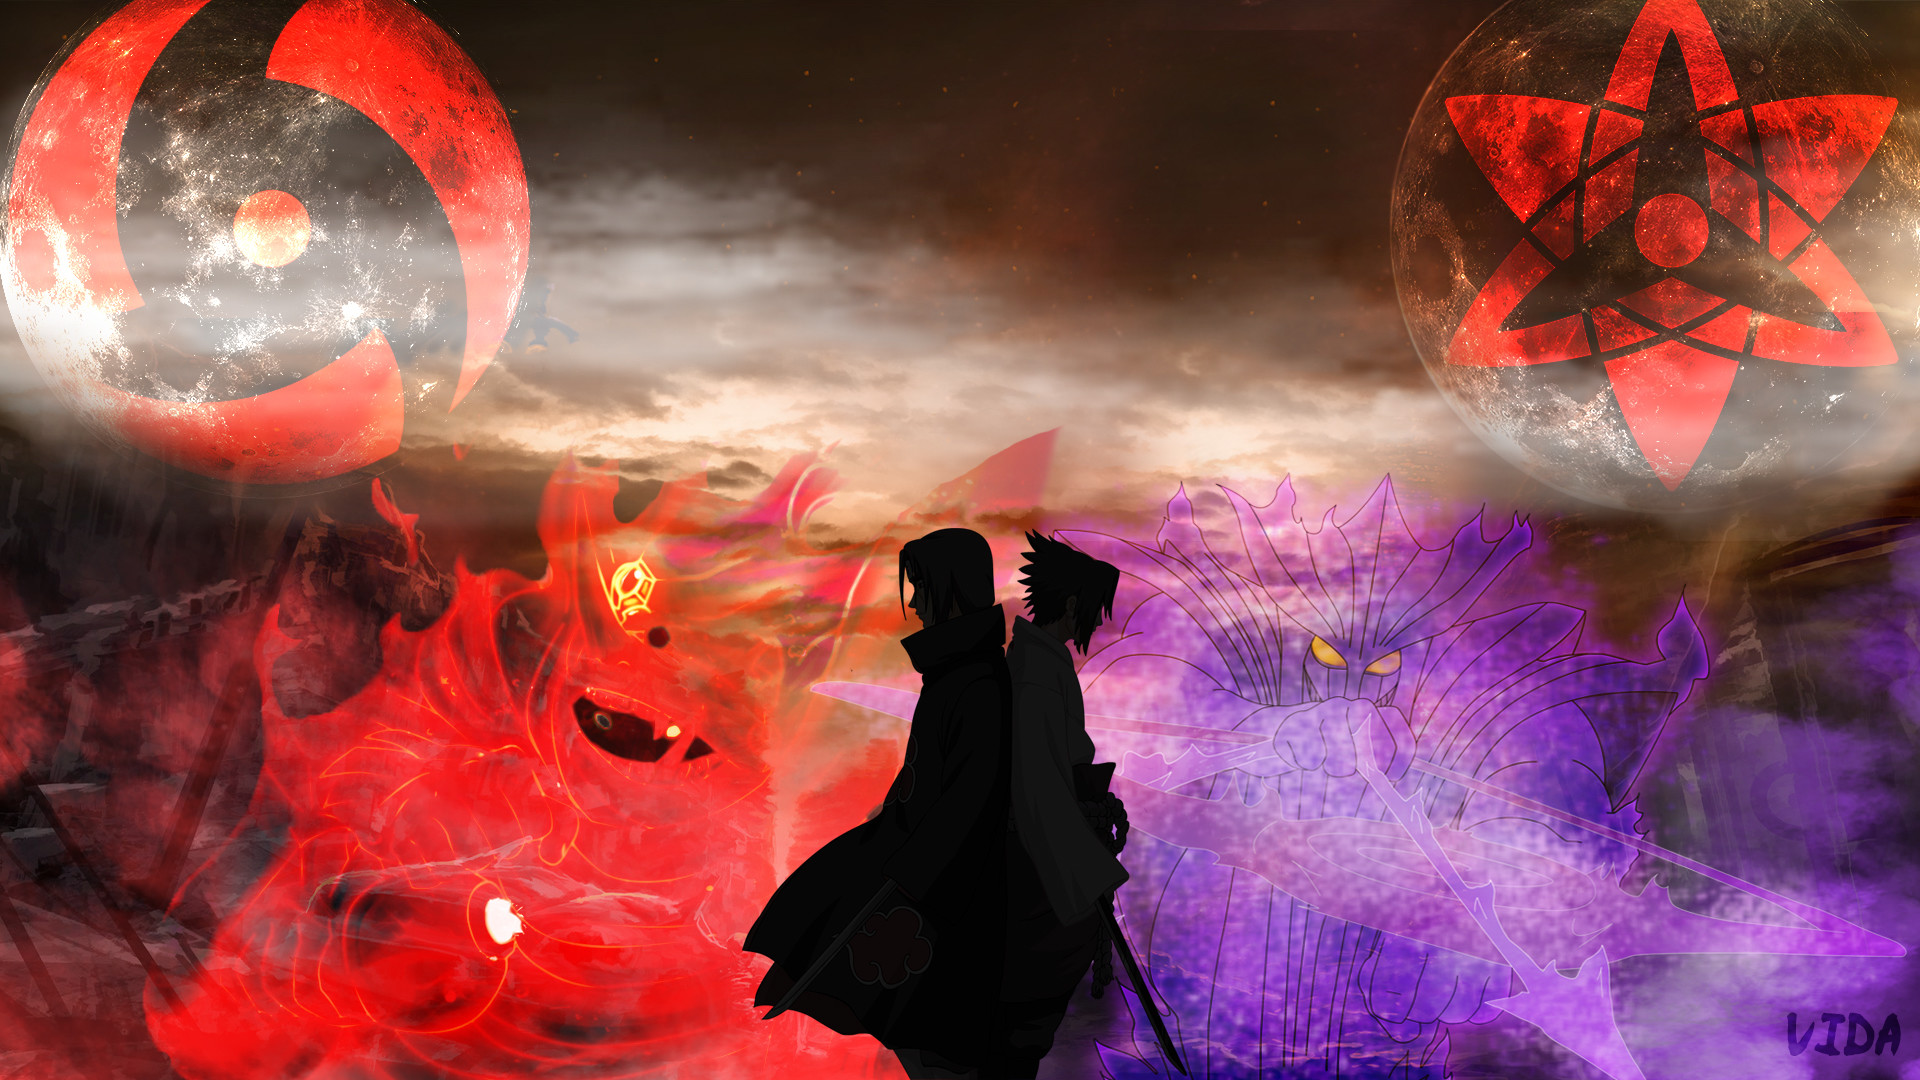 Sasuke Itachi Wallpaper Full HD by Vida996 on DeviantArt